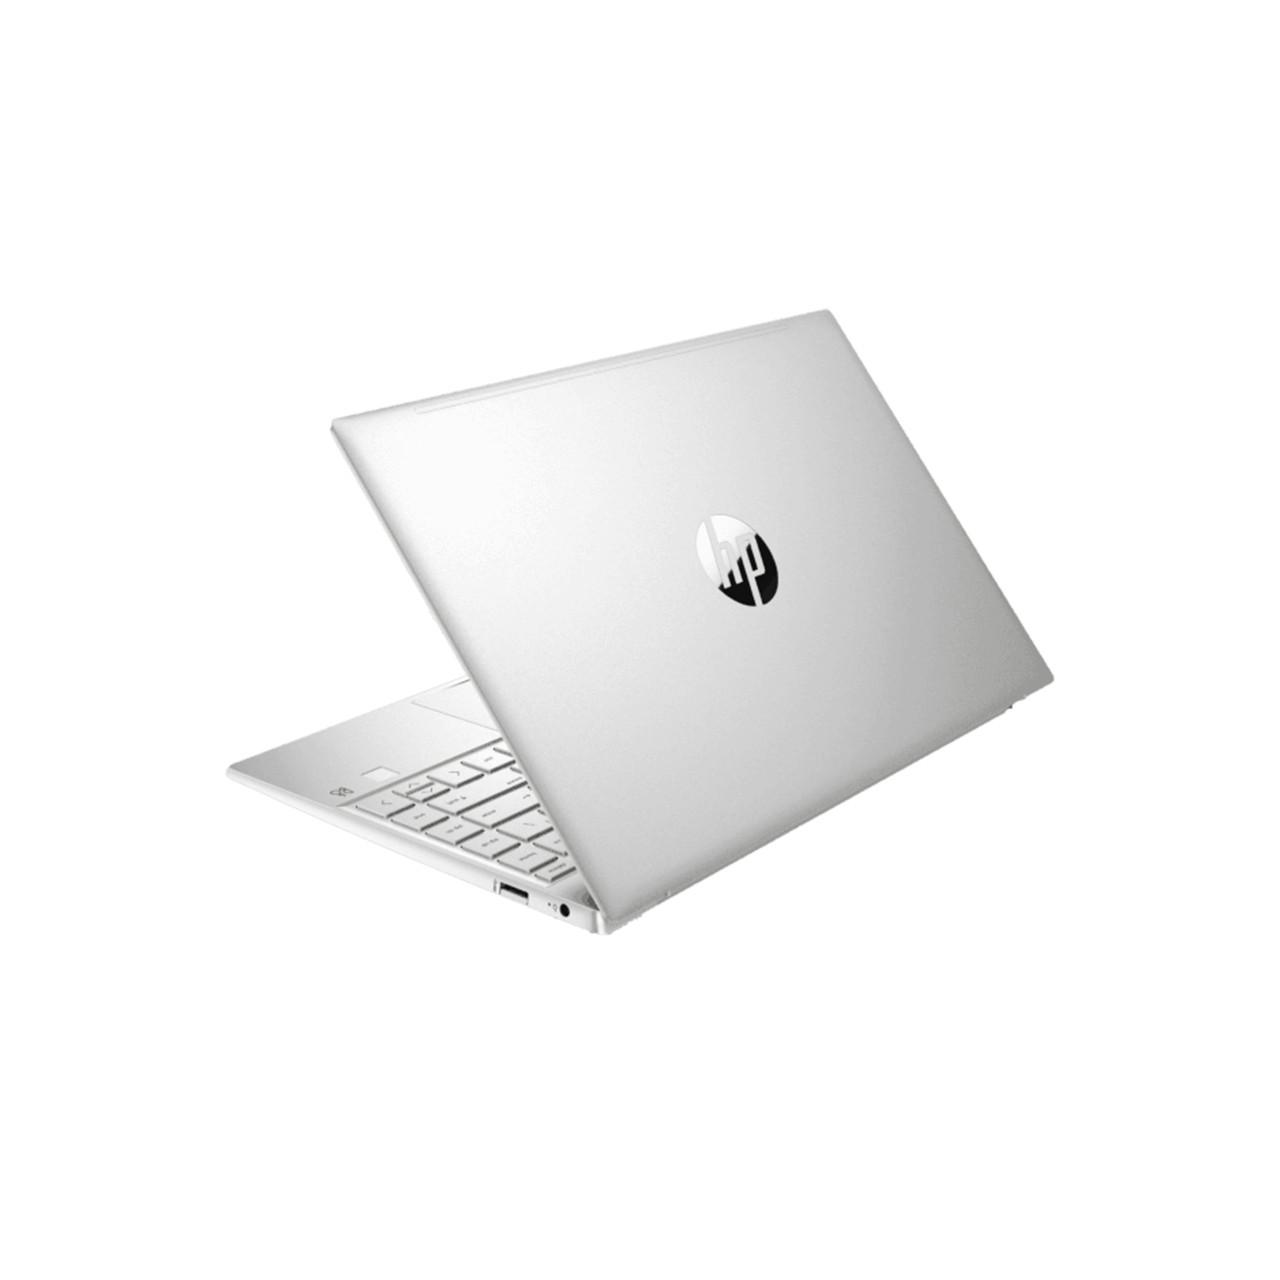 HP-13-BB0015TU